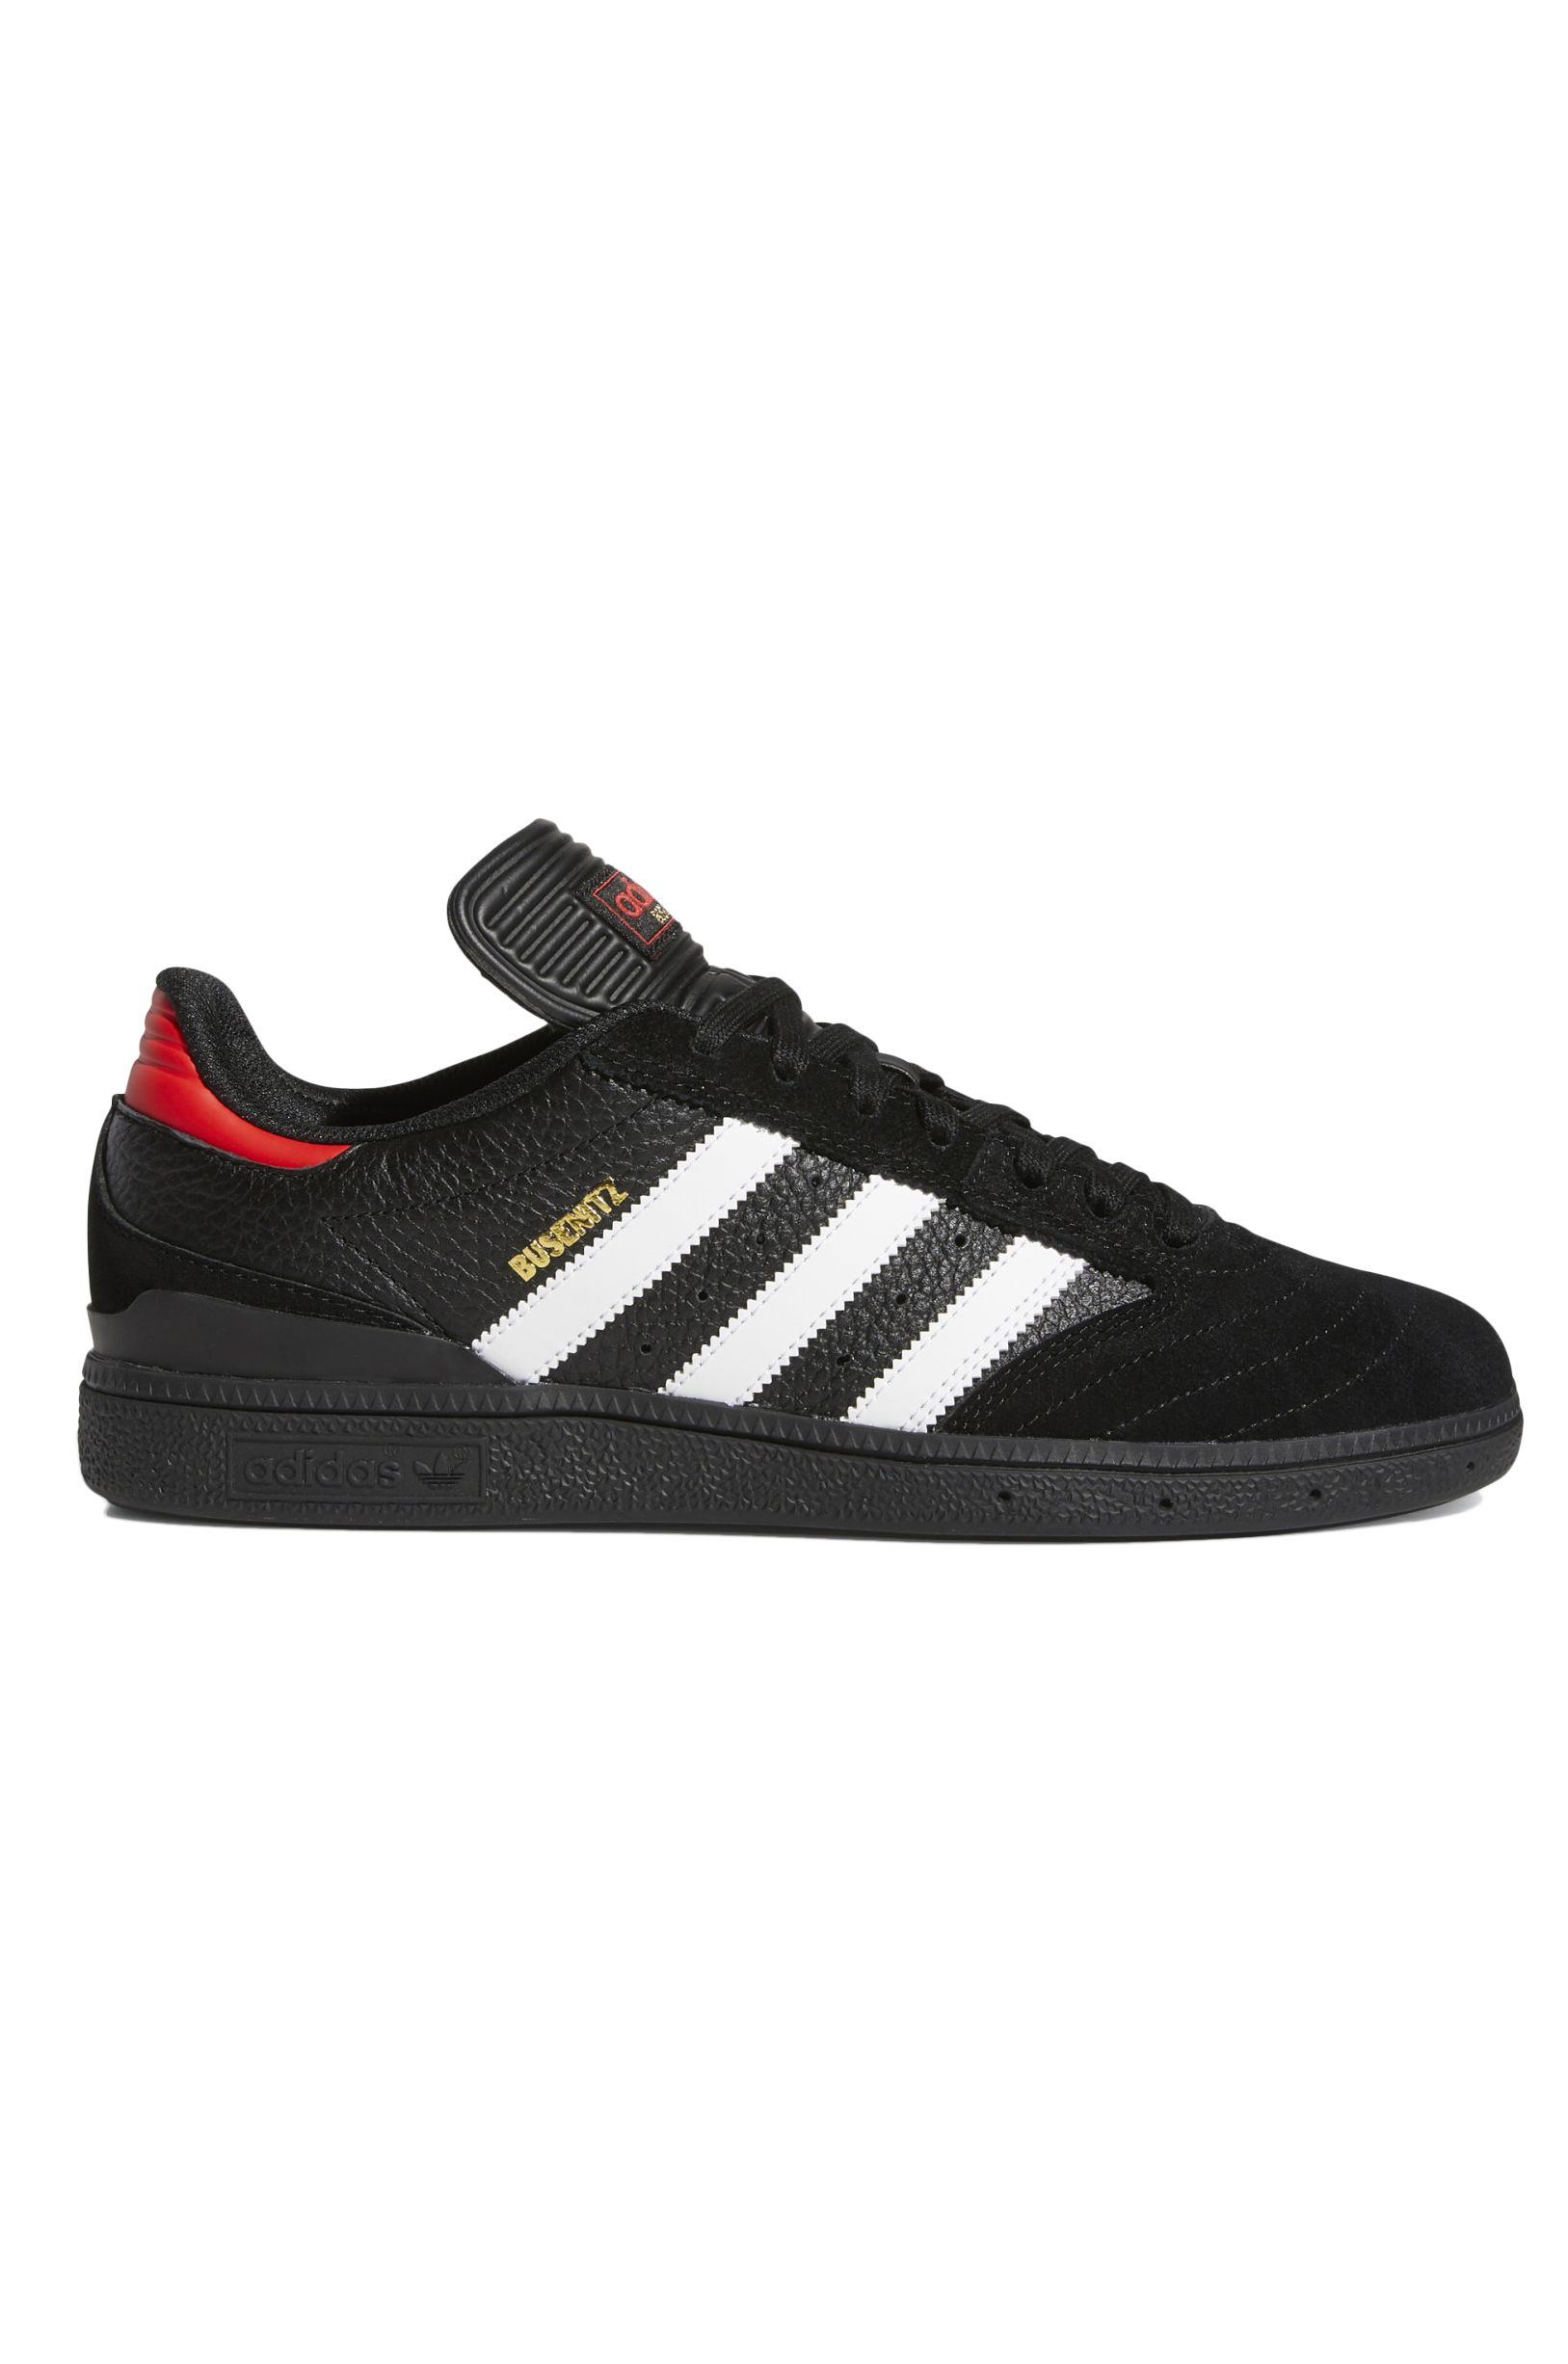 Adidas Shoes BUSENITZ Core Black/Ftwr White/Vivid Red